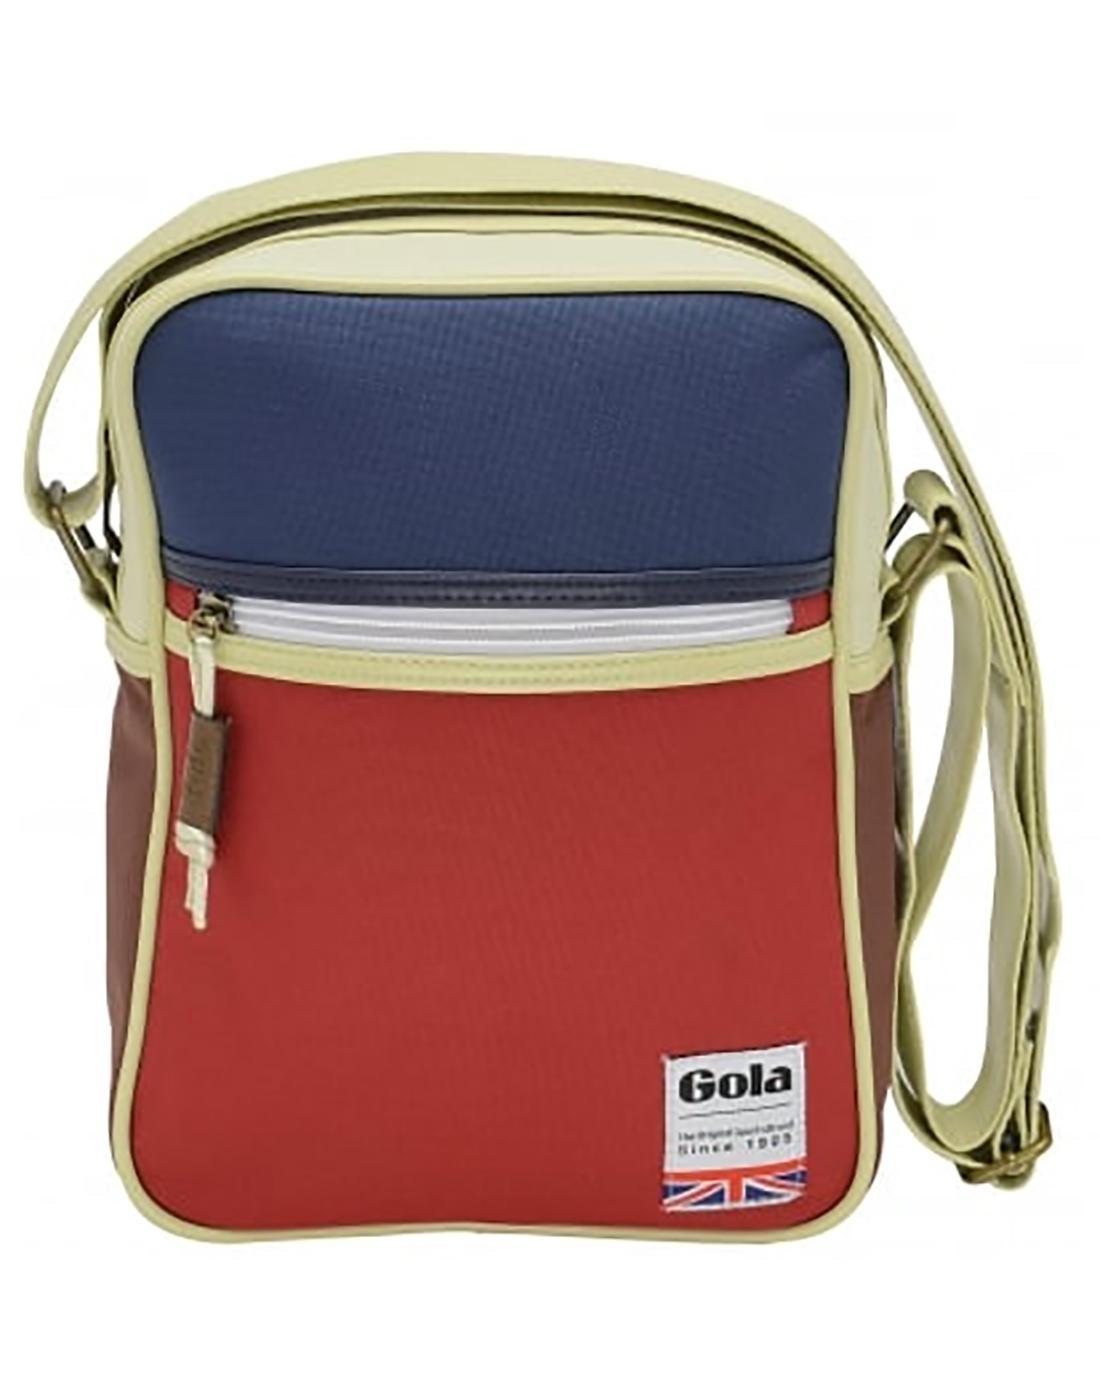 Mini Bronson GOLA Retro 70s Mini Messenger Bag